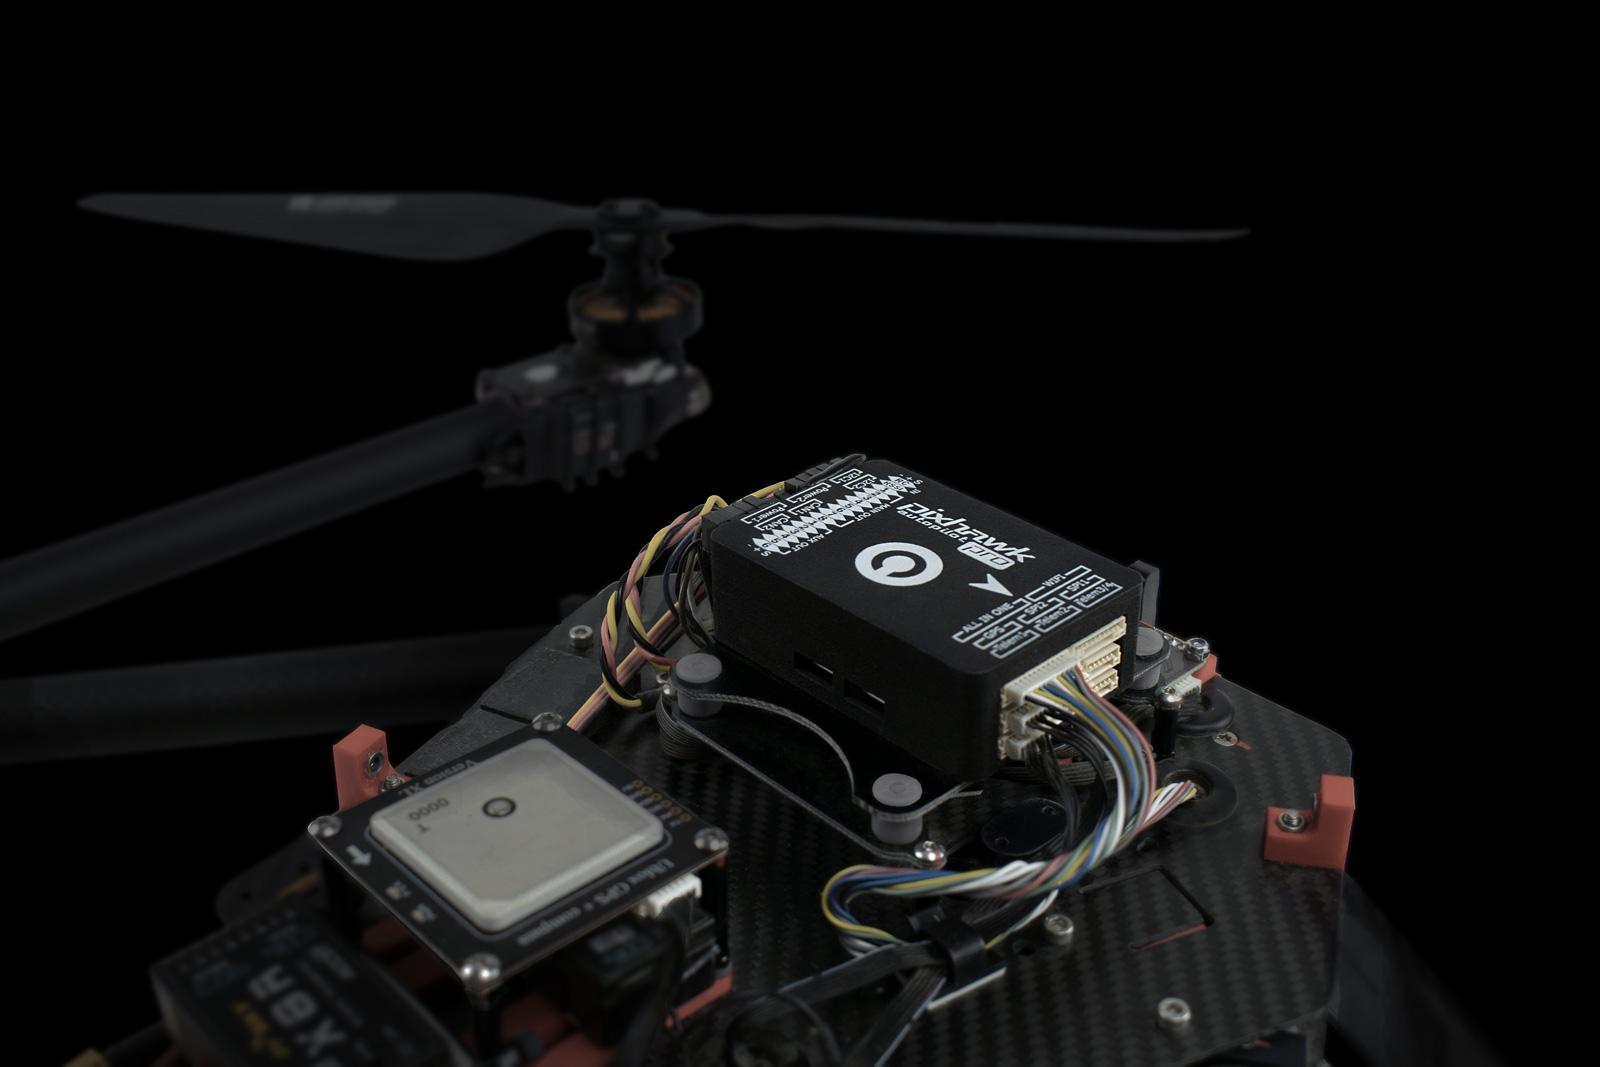 Pixhawk 3 Pro Autopilot (aluminum case)